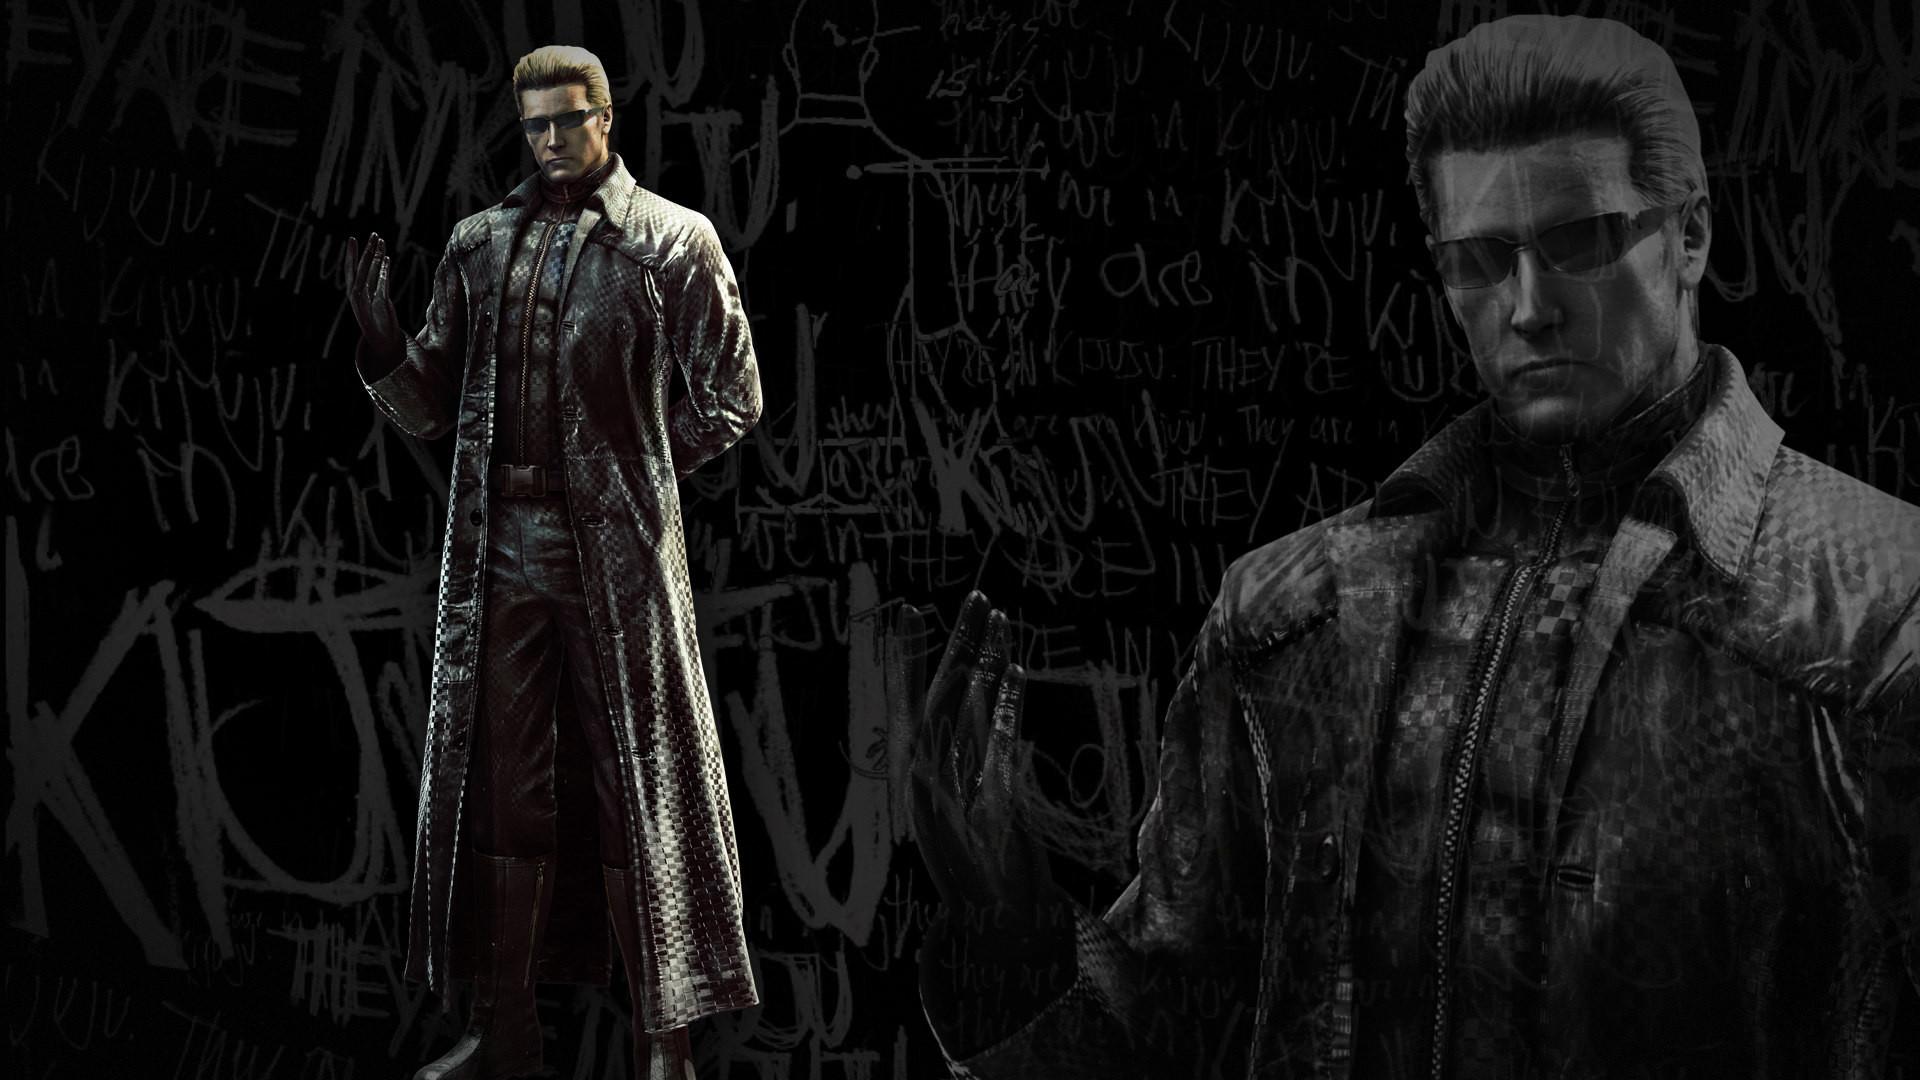 Res: 1920x1080, Resident Evil 5 Biohazard 5 Artwork 9.png